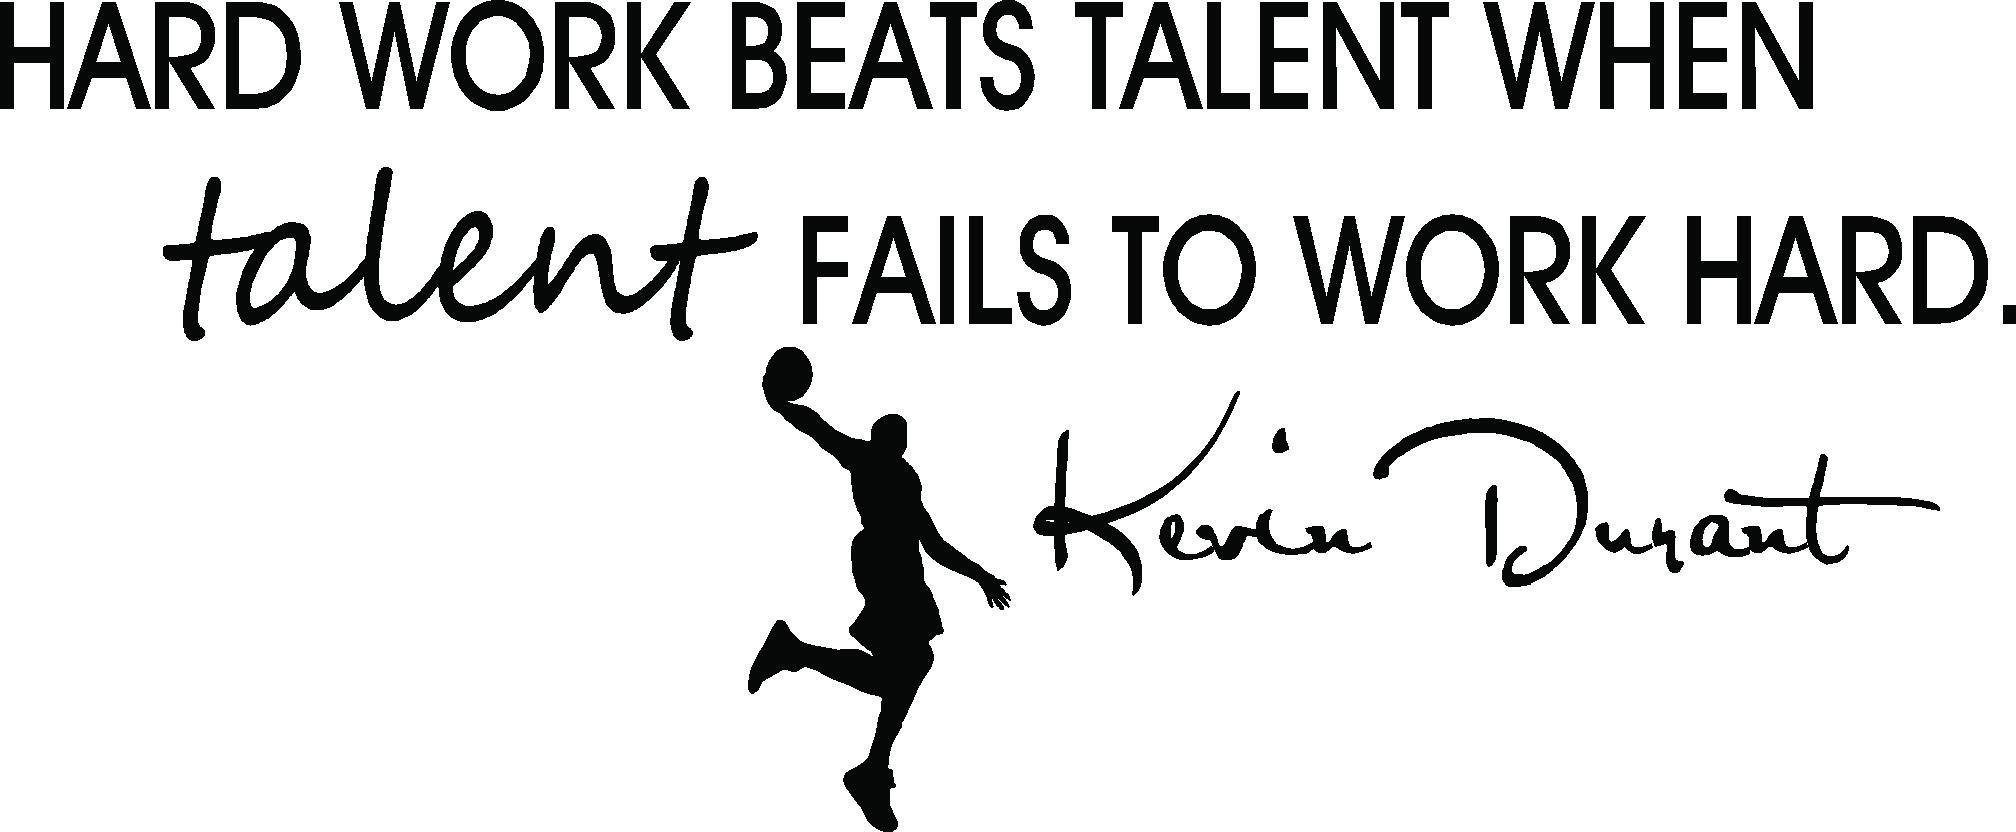 Hard Work Never Fails Quotes: Amazon.com: Hatop Basketball Dunk Sports Vinyl Decal Art